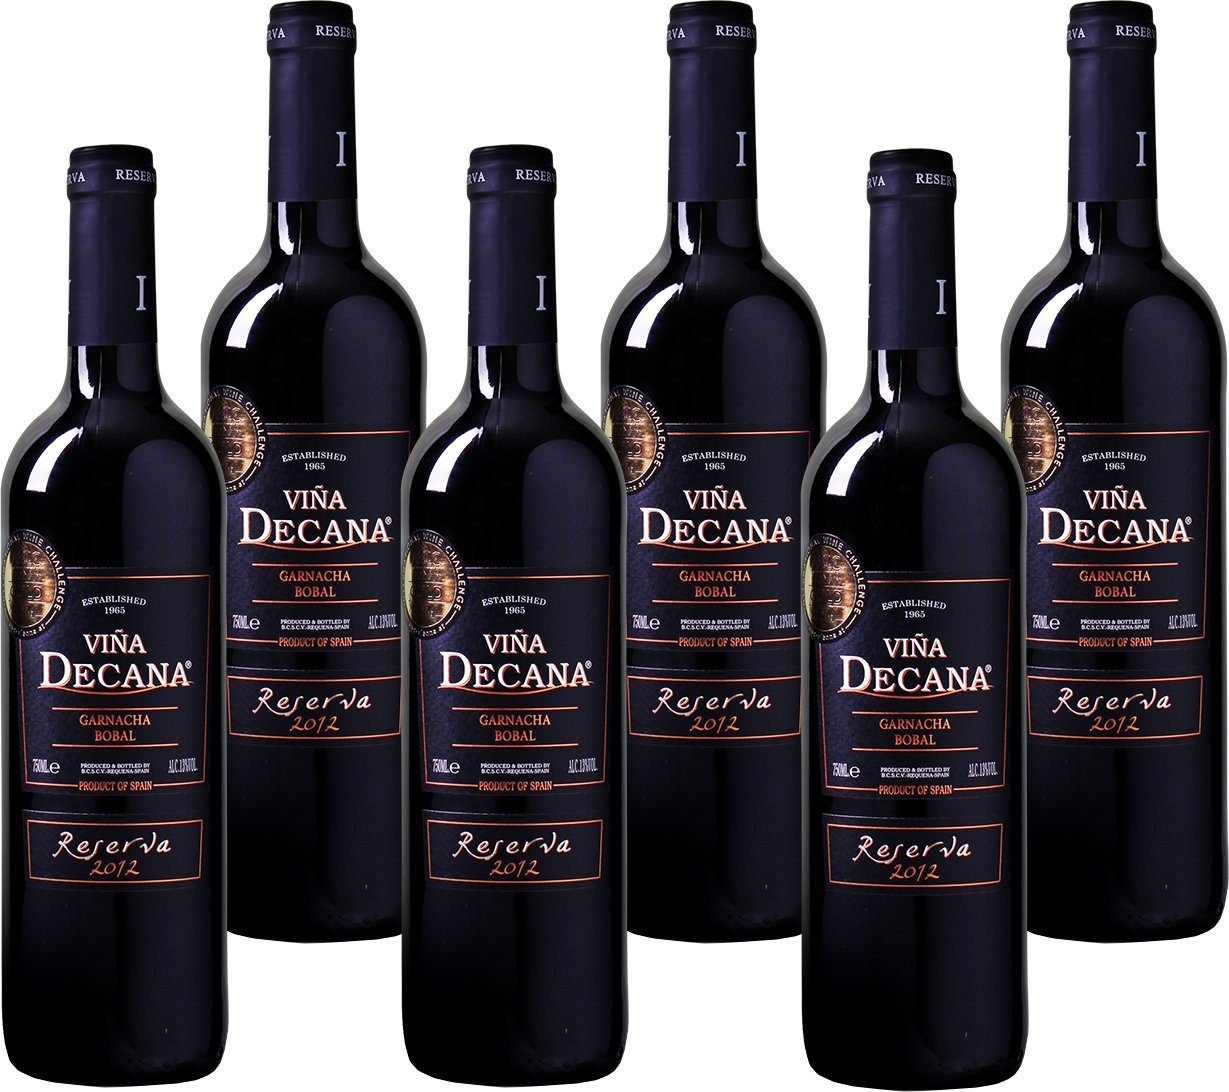 Rotwein aus Spanien, 12,5 Vol.-%, 4,5 l »2015 Bodegas Viñedos Contralto«